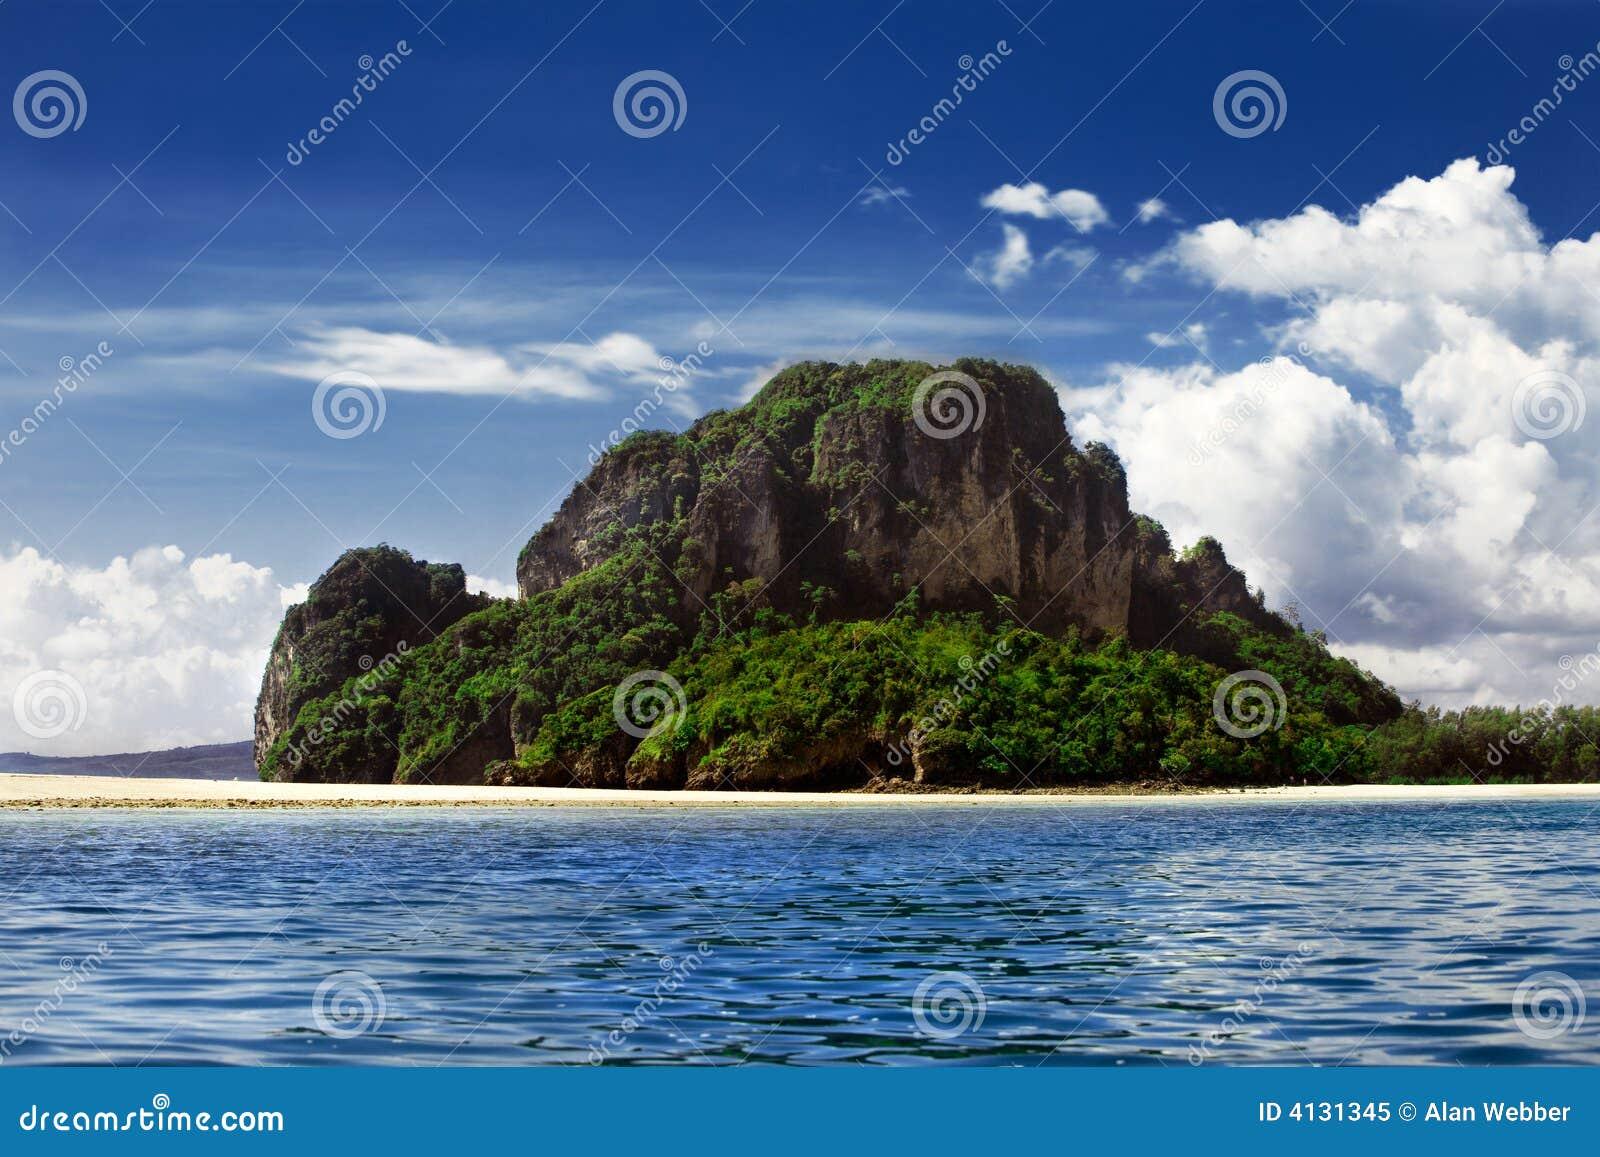 Deserted Tropical Island: Deserted Island Royalty Free Stock Photo